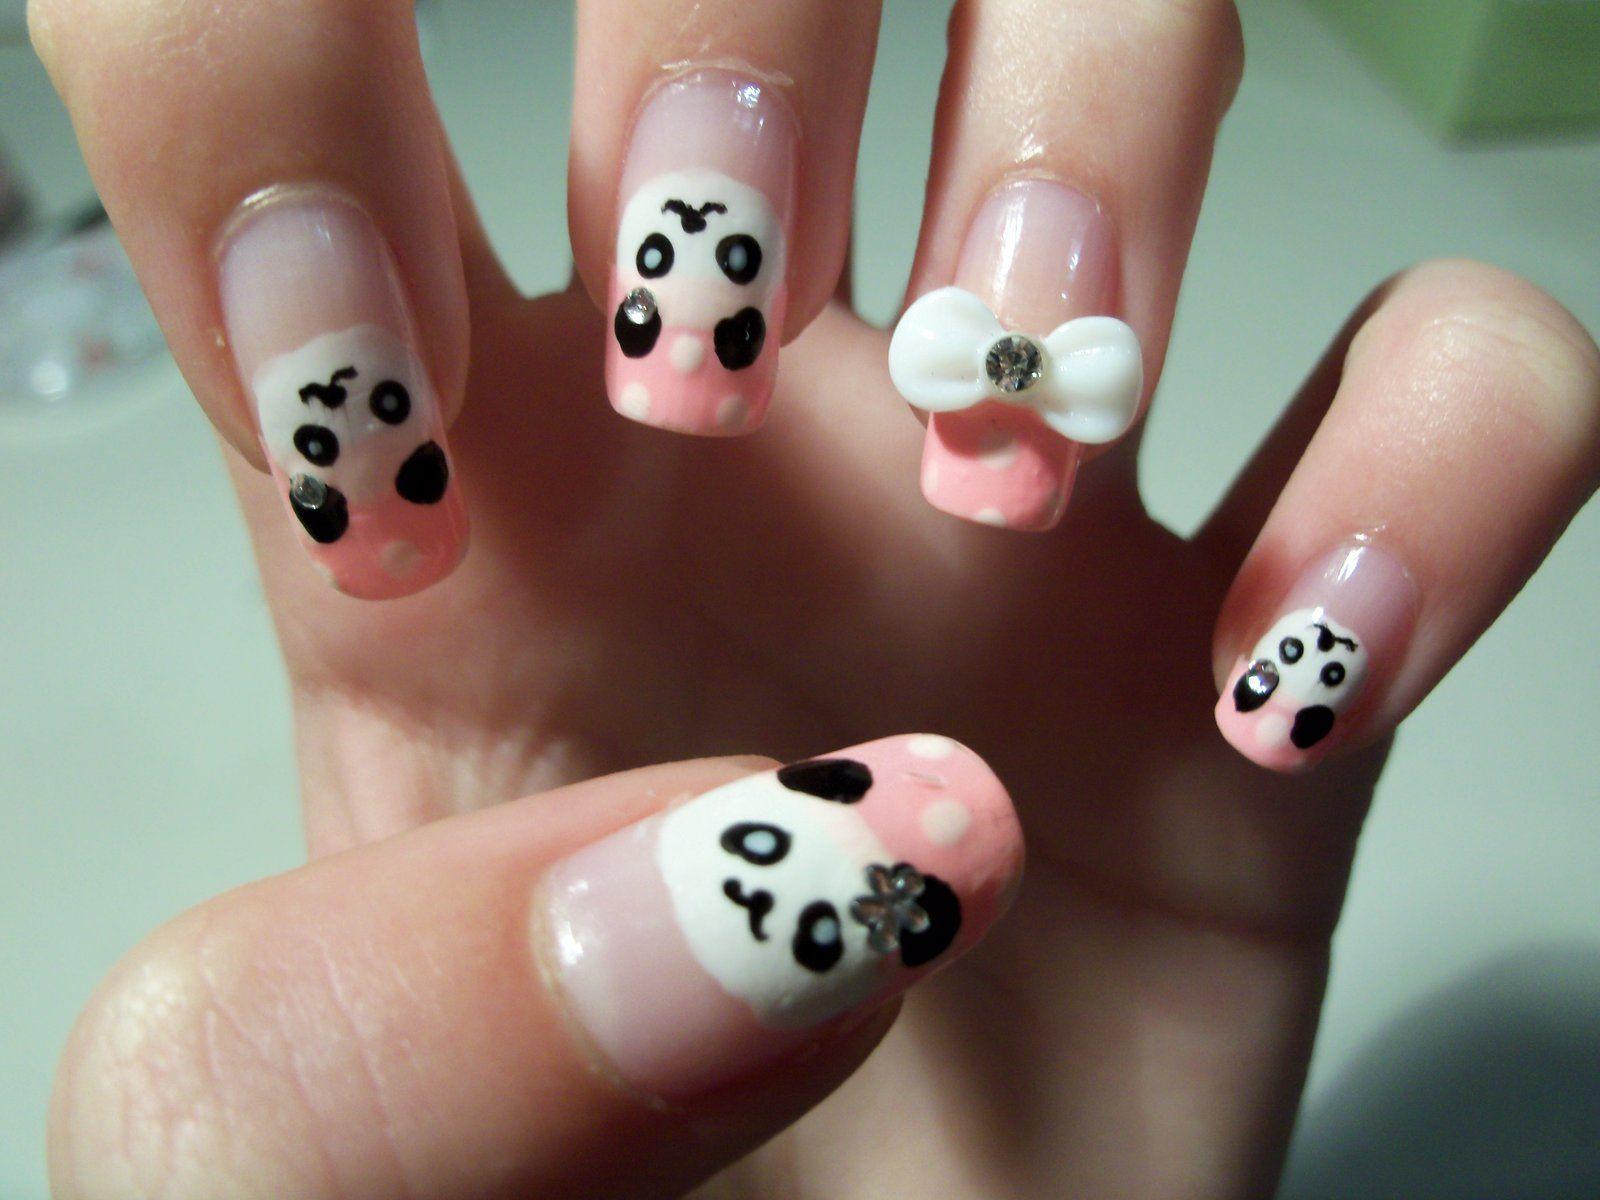 panda_nail_art_by_mimimemeko-d365idu.jpg 1.600×1.200 piksel